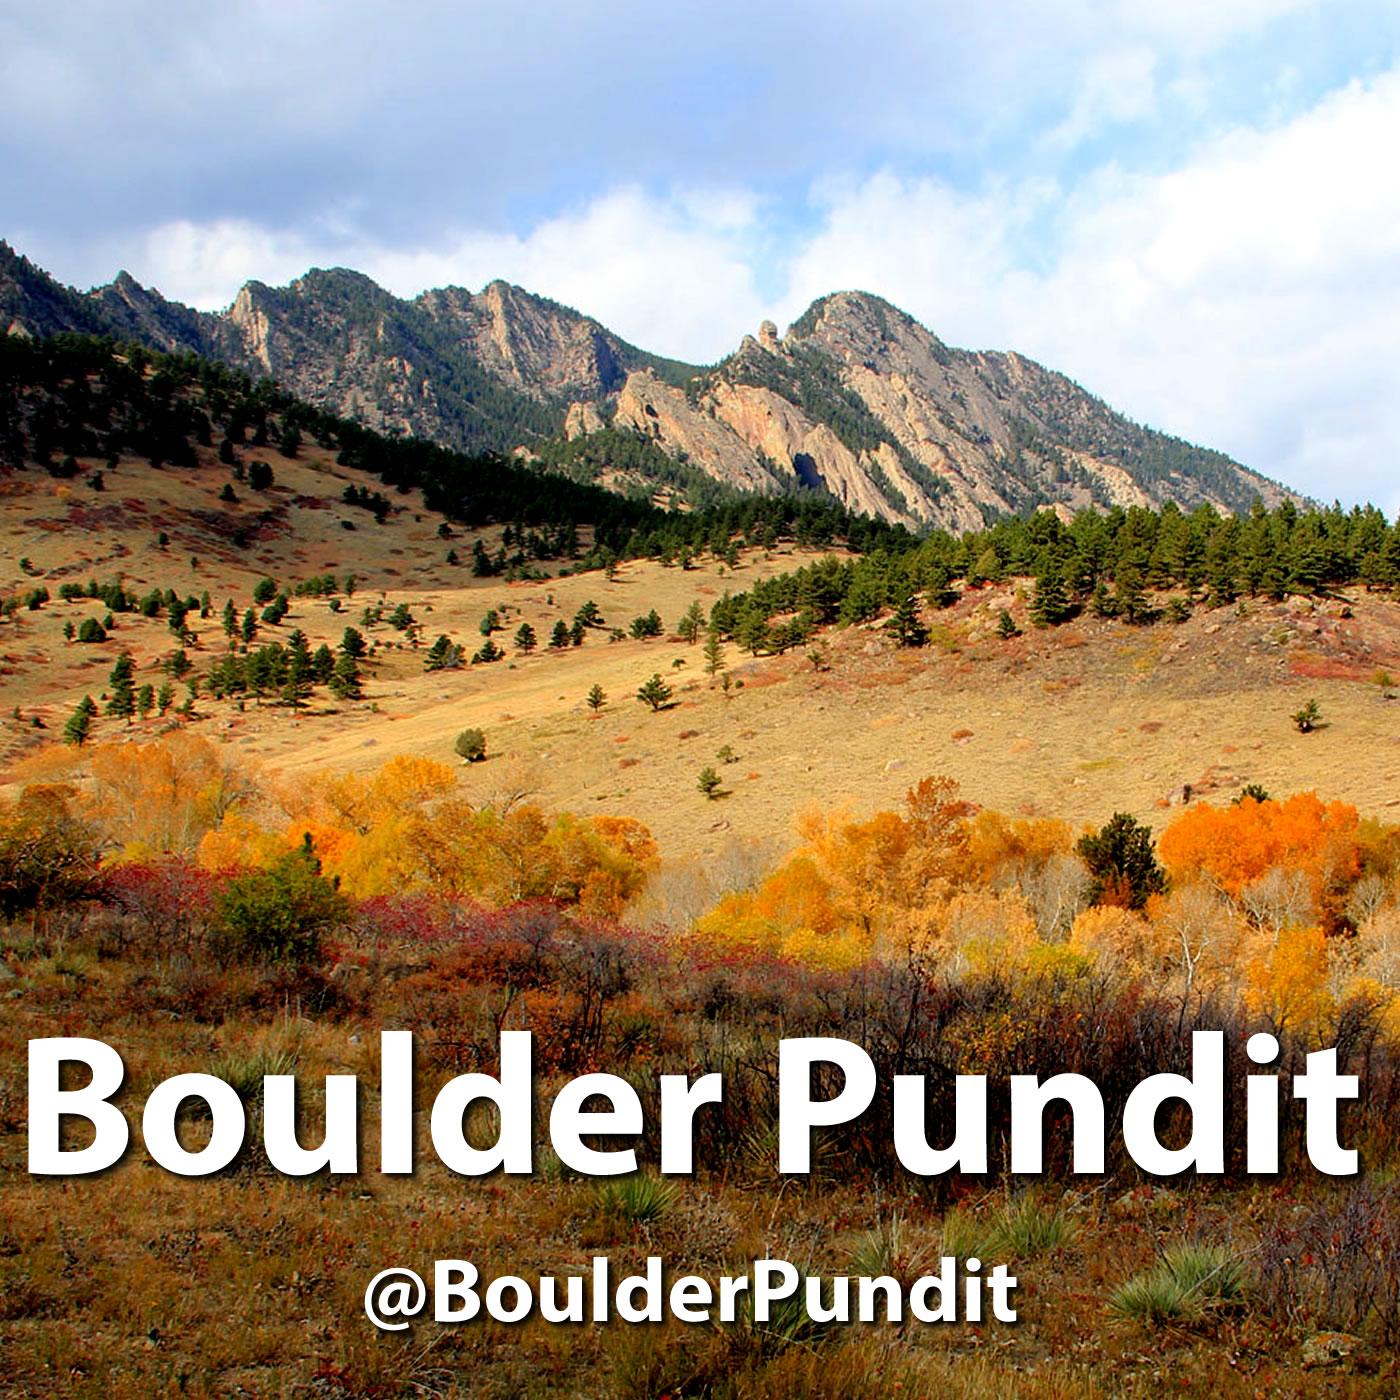 BoulderPundit